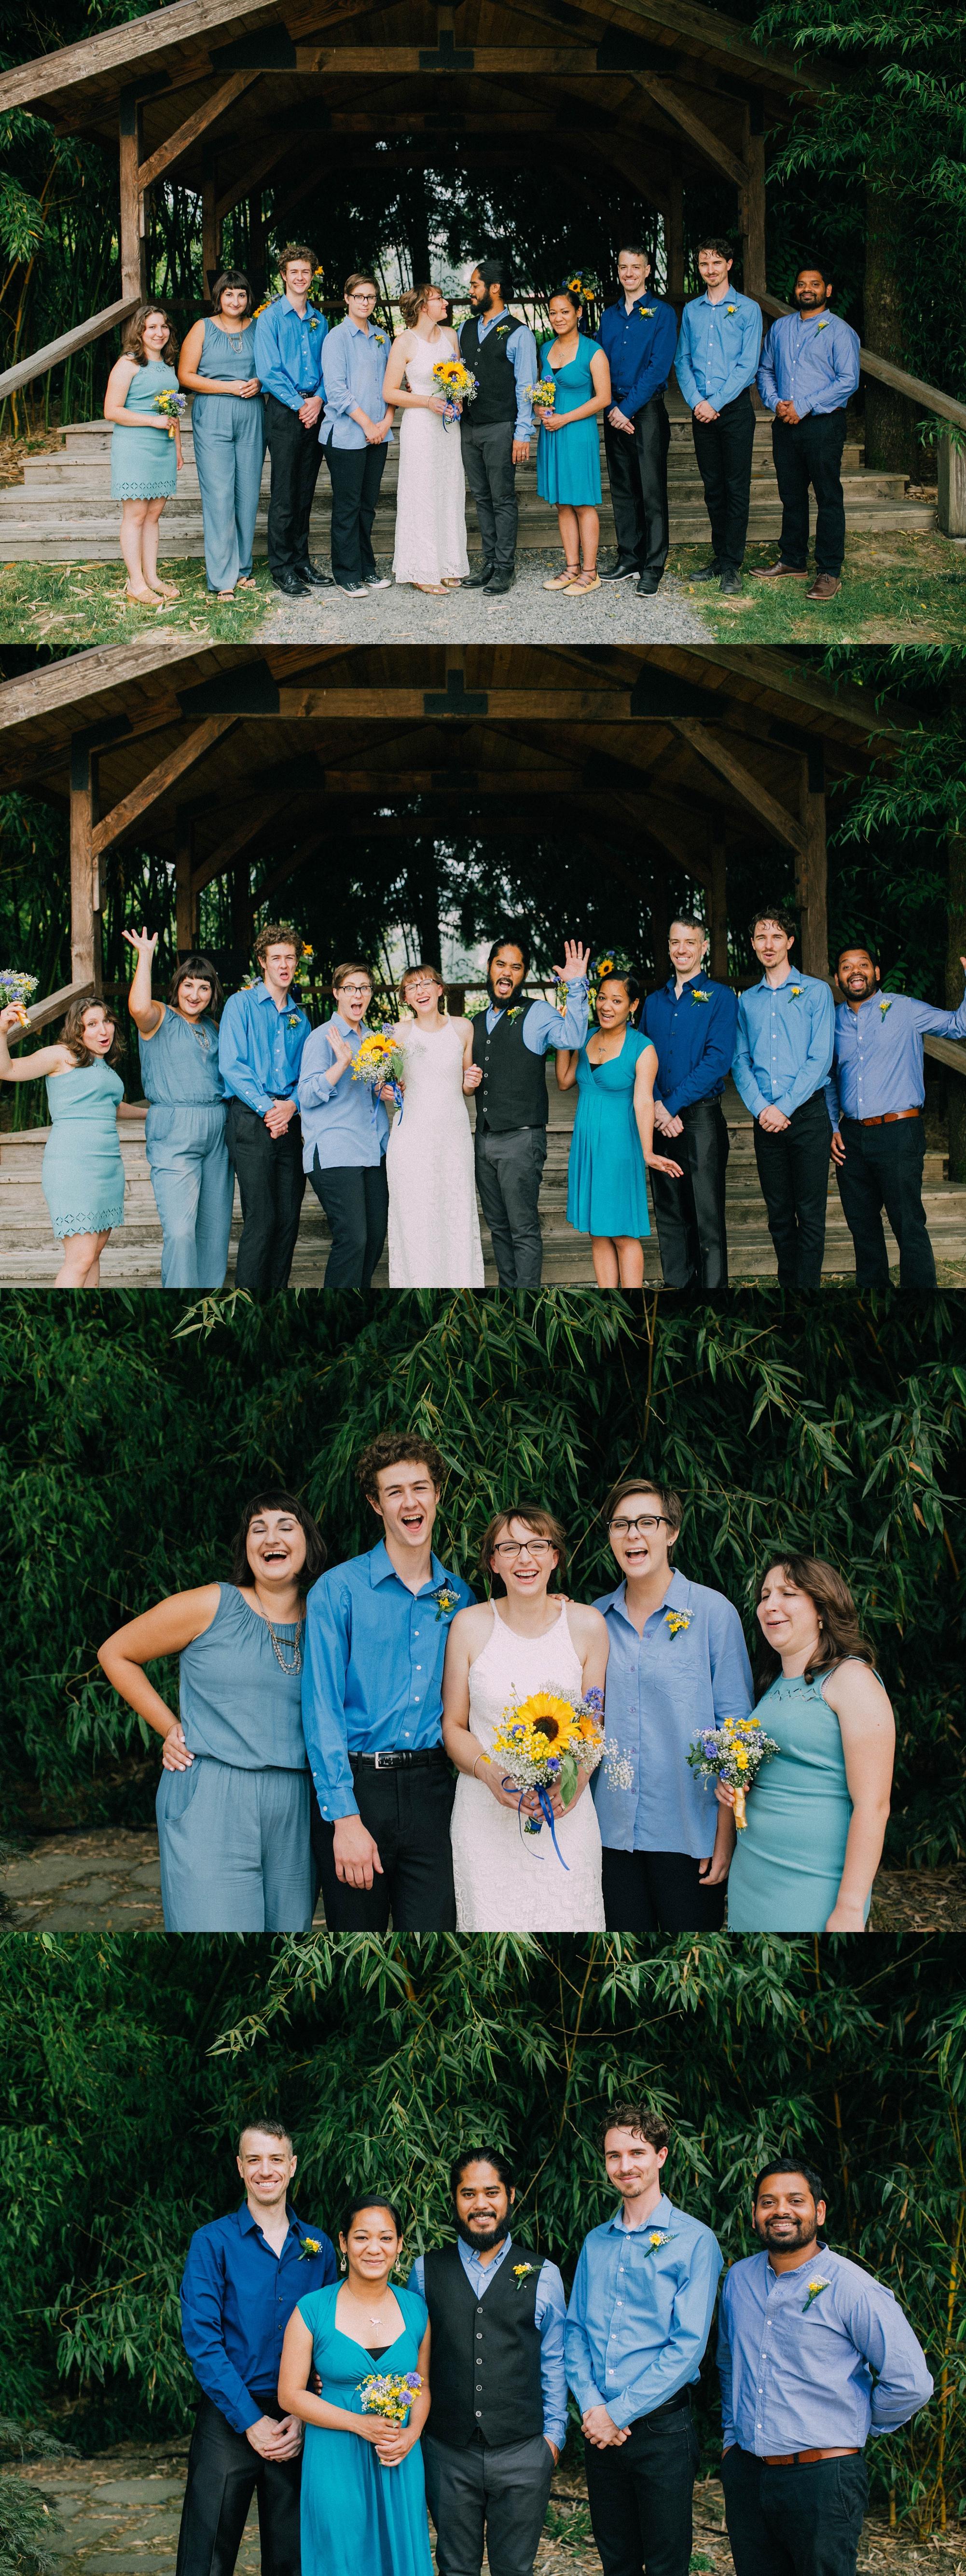 ashley_vos_seattle_ wedding_photographer_0450.jpg